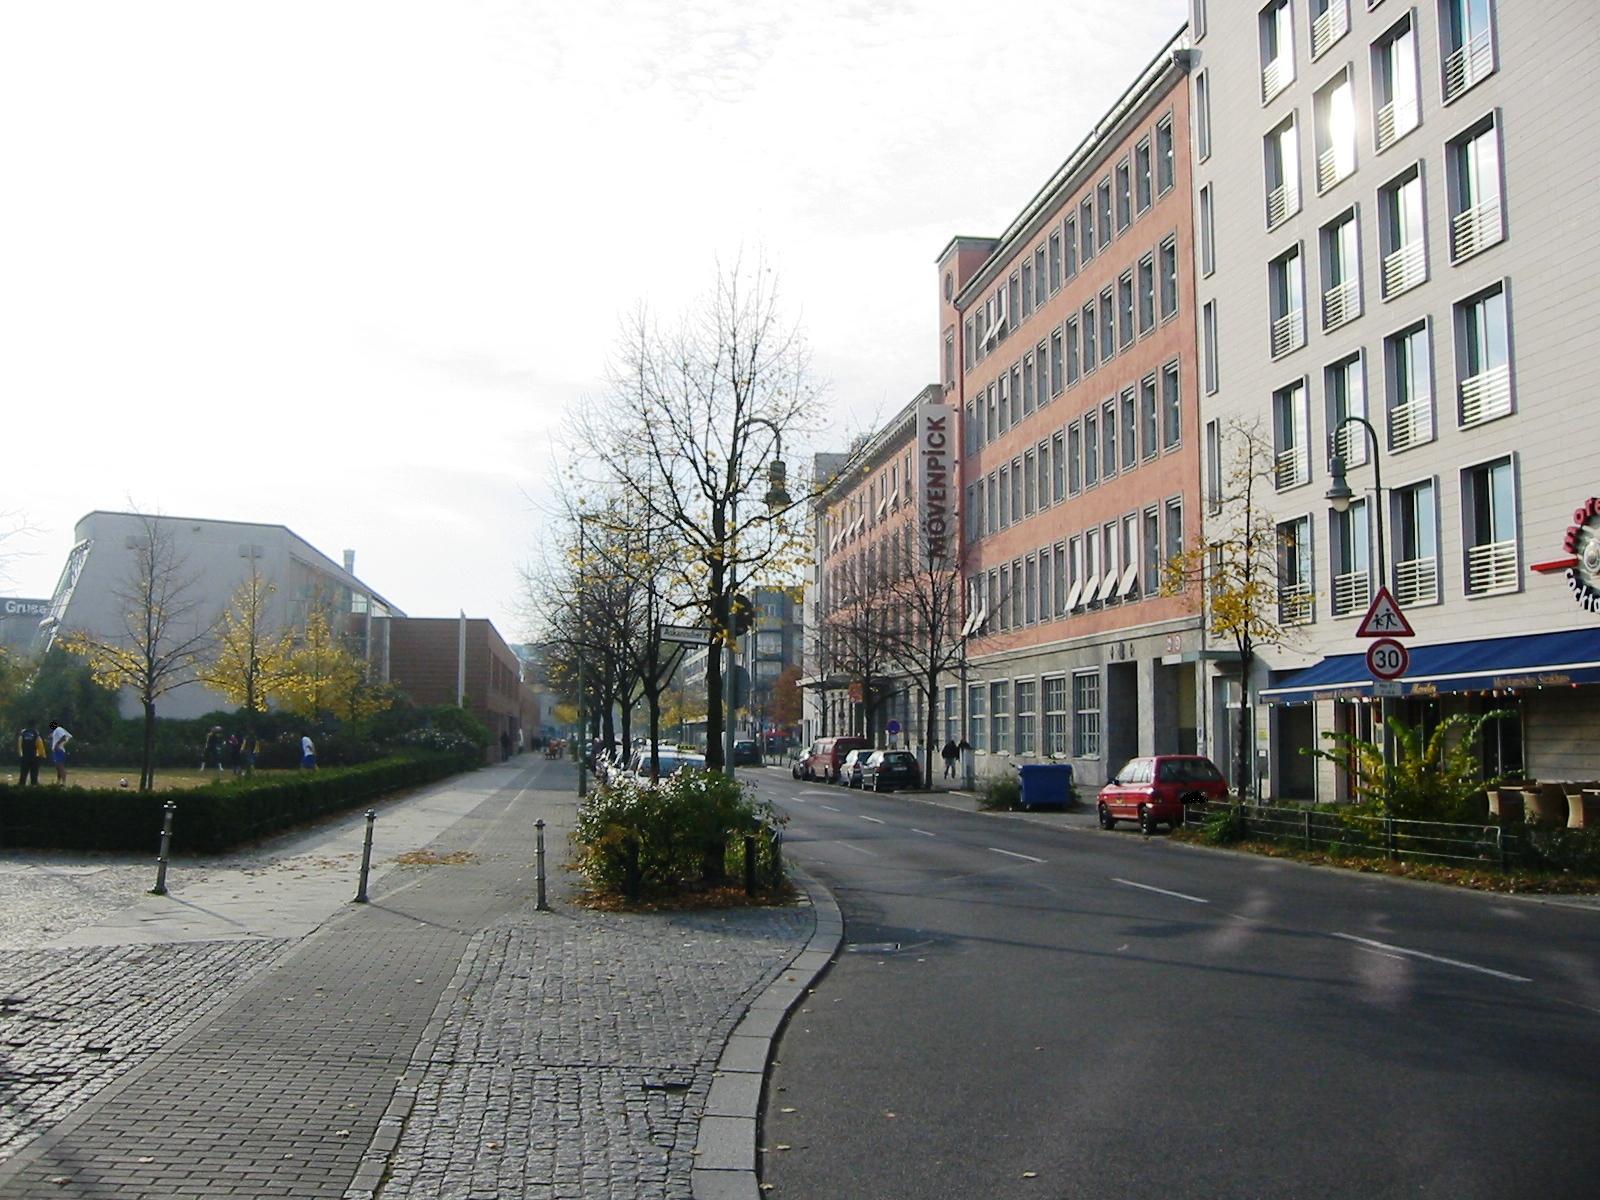 Datei:Berlin-Kreuzberg Schöneberger Straße.jpg – Wikipedia